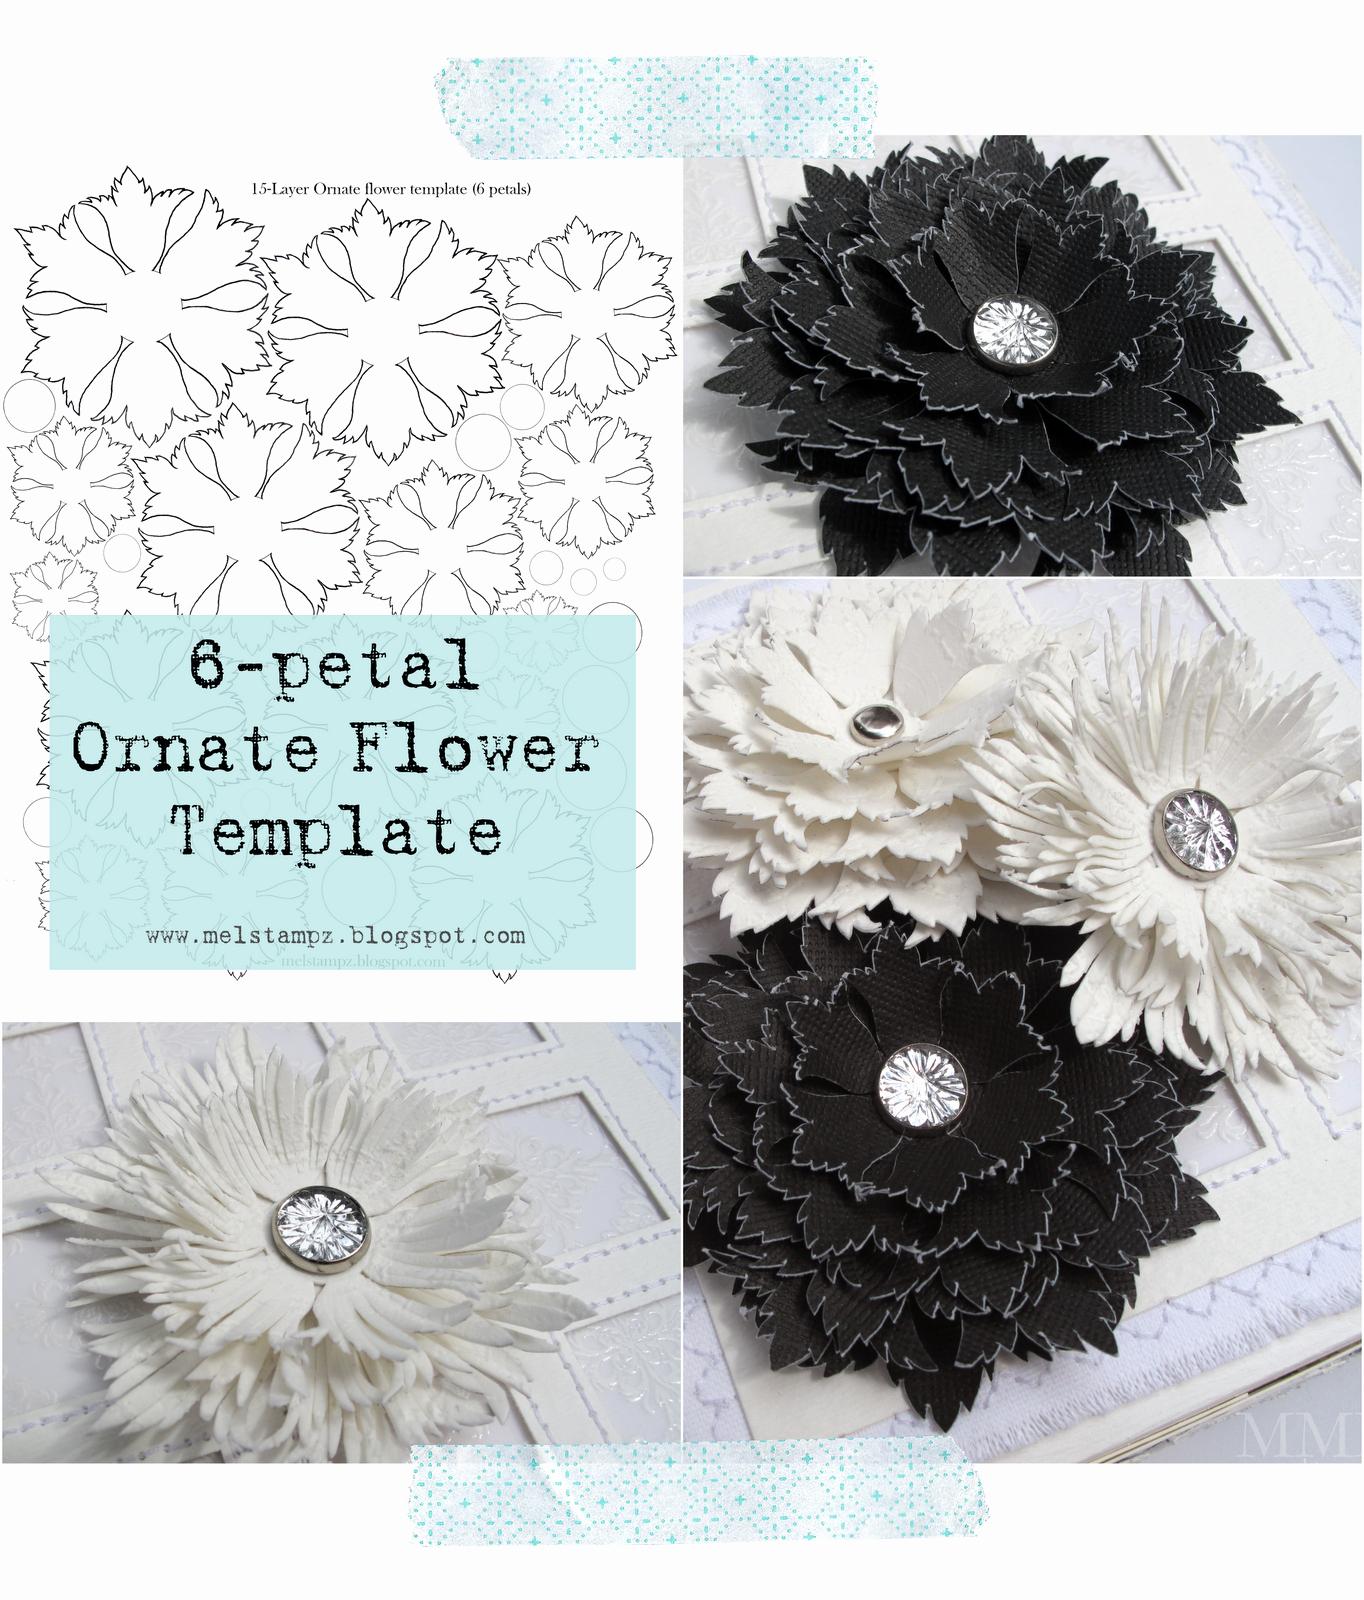 Diy Paper Flower Template Luxury Mel Stampz 6 Petal ornate Flower Template